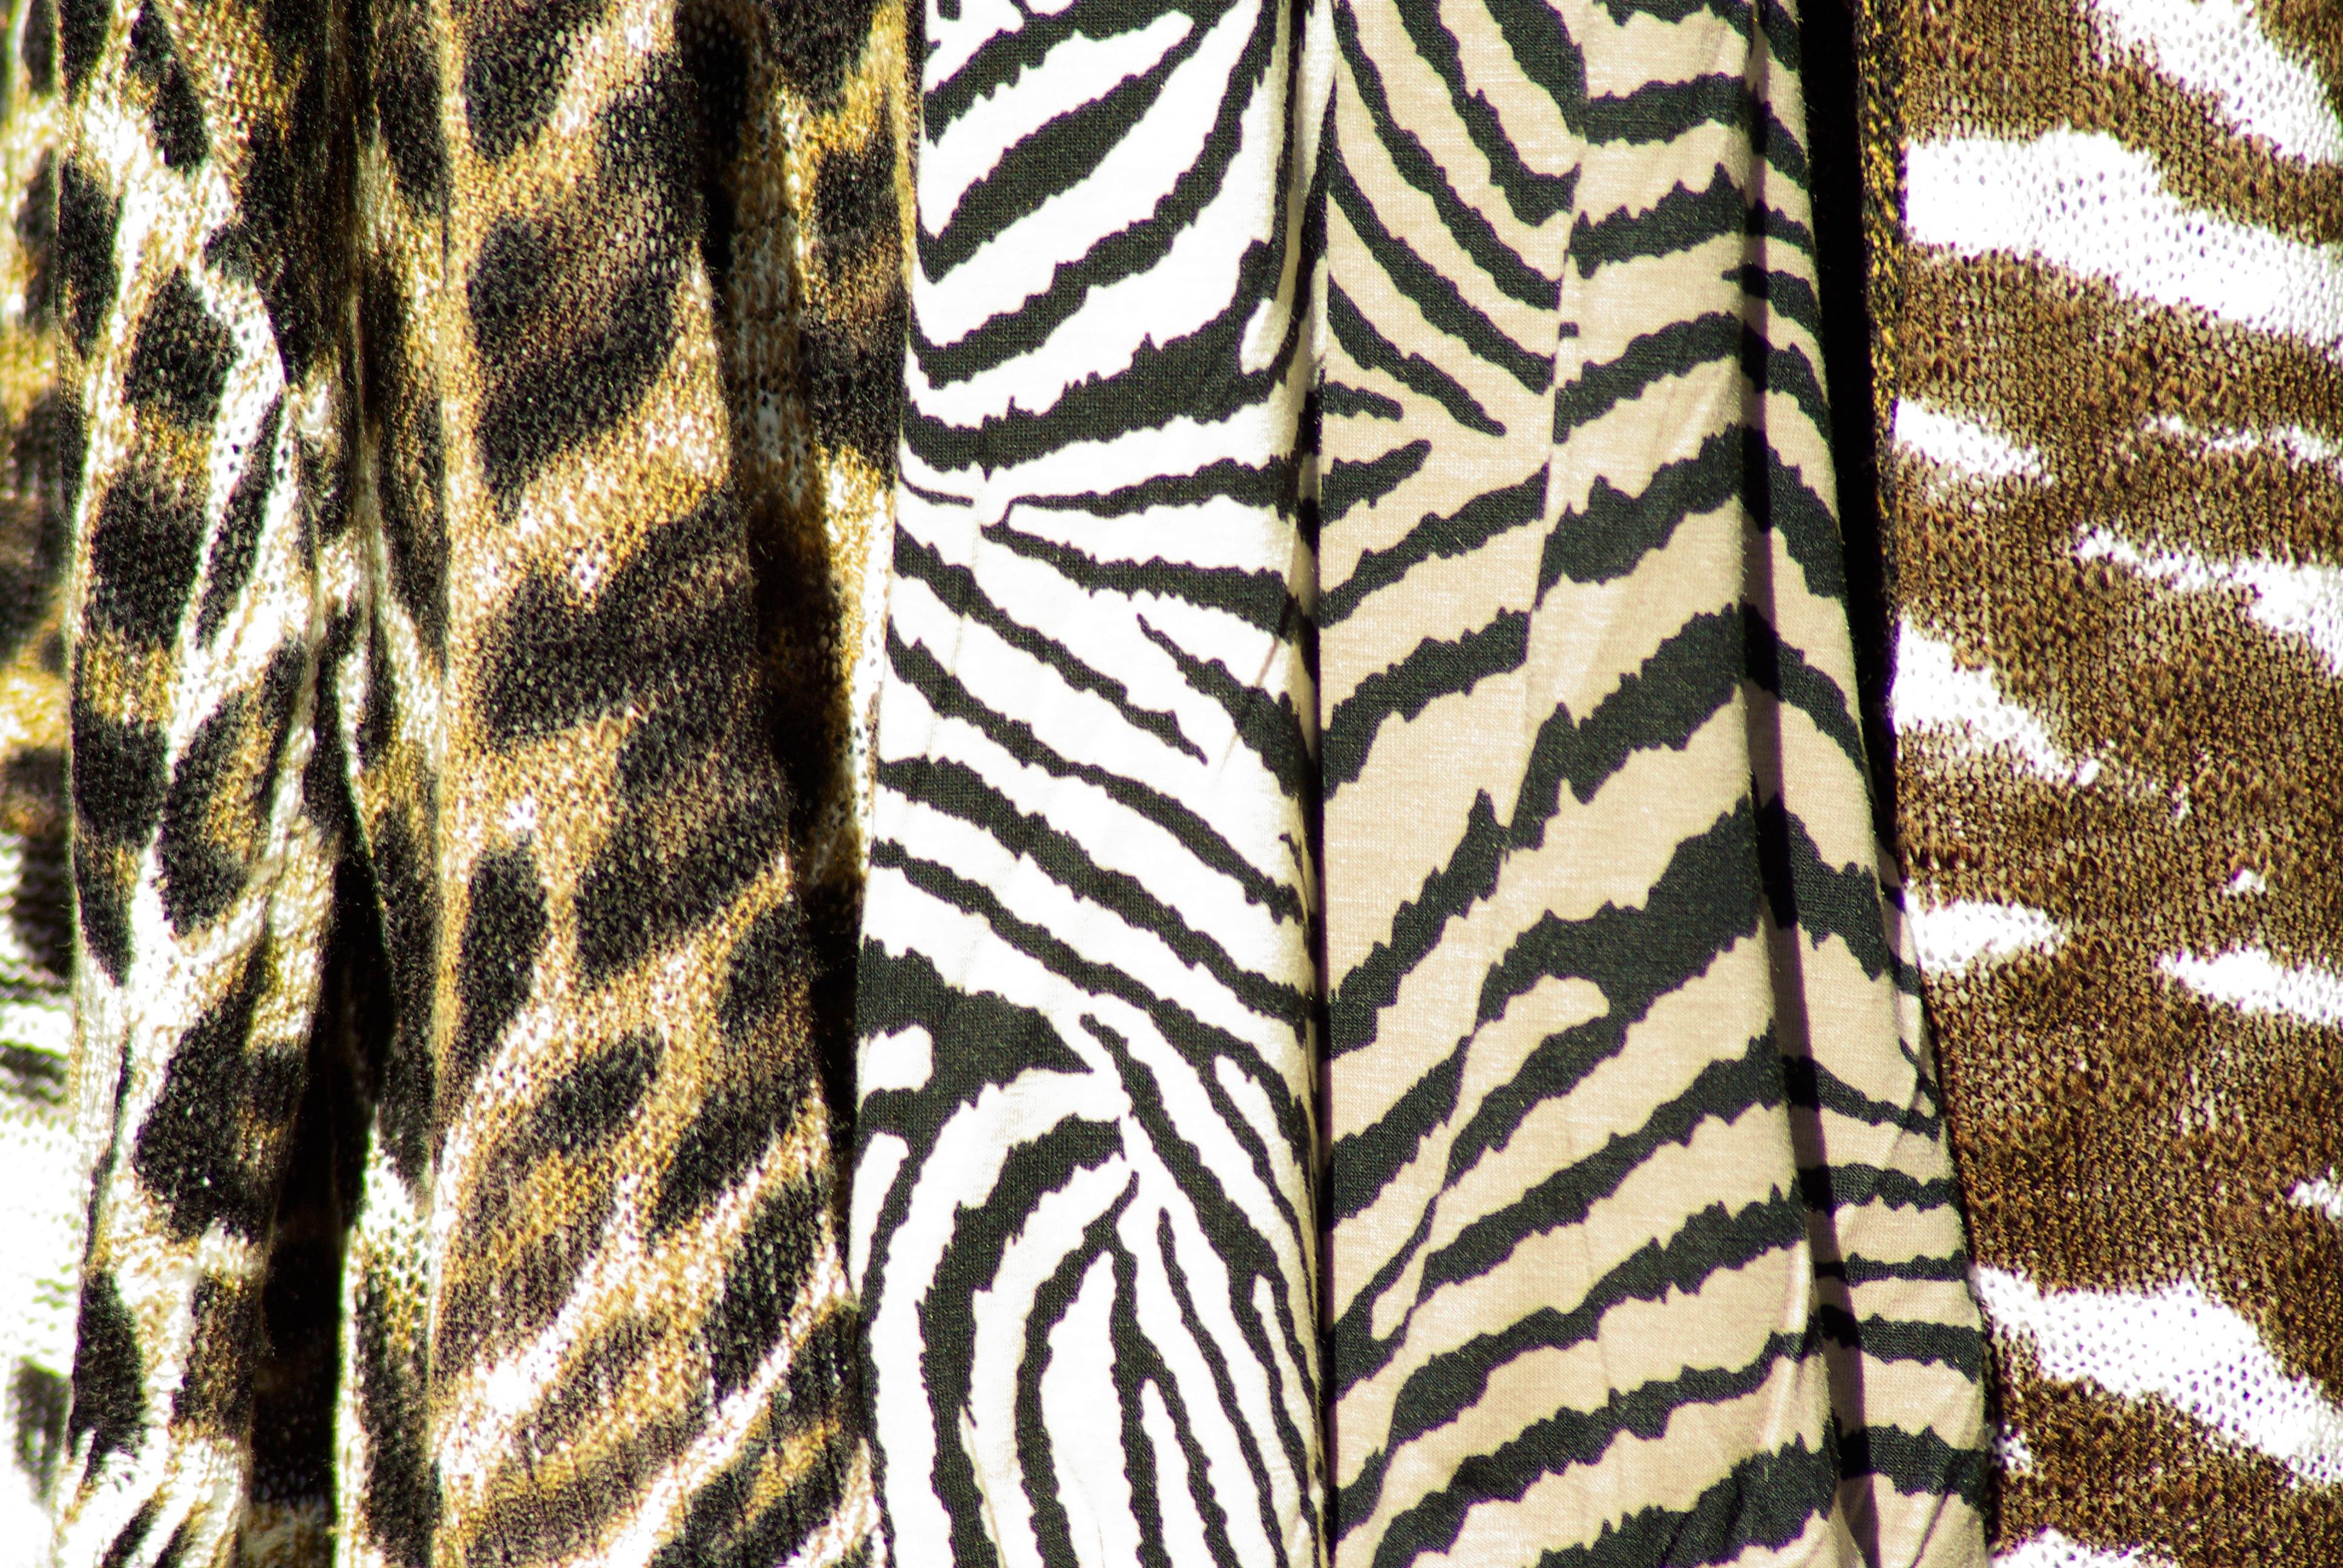 Free Images : fauna, zebra, knitting, vertebrate, fabrics, tawny ...